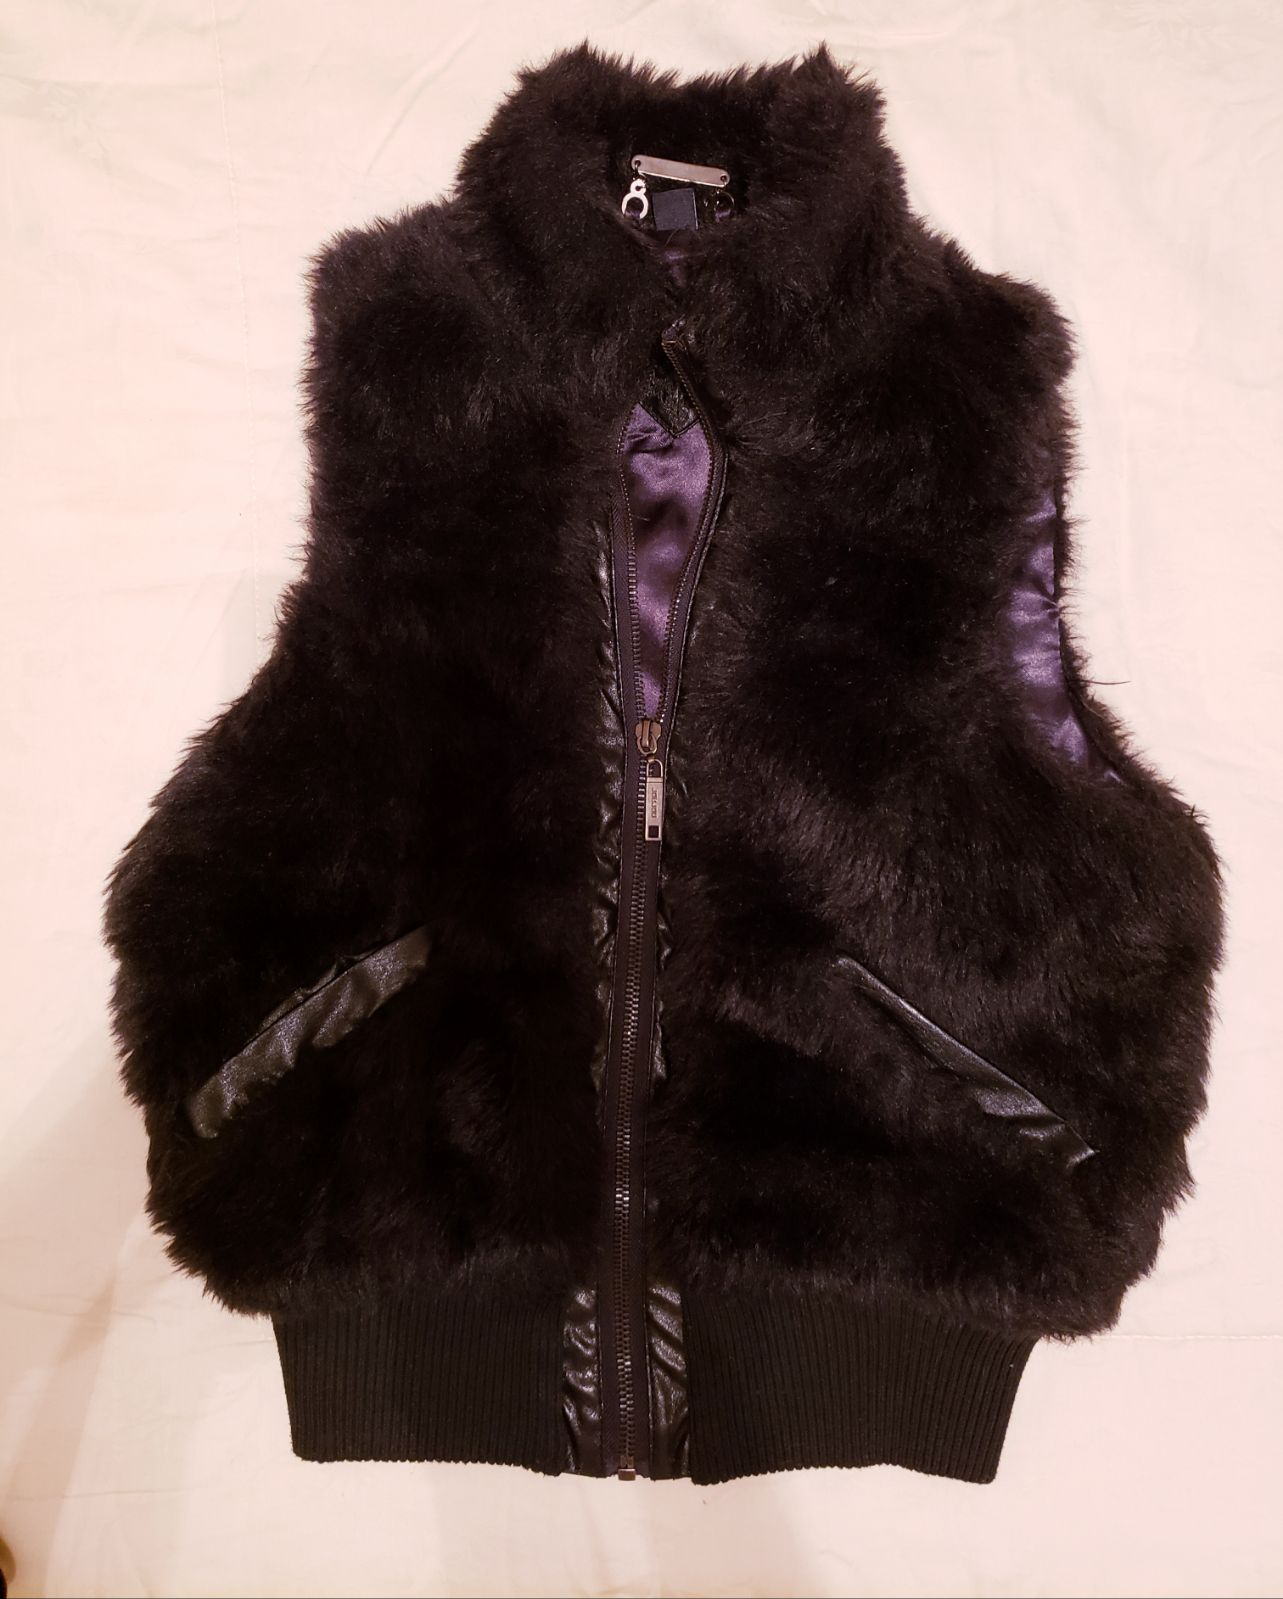 Faux Fur Vest for girls 14/16 black